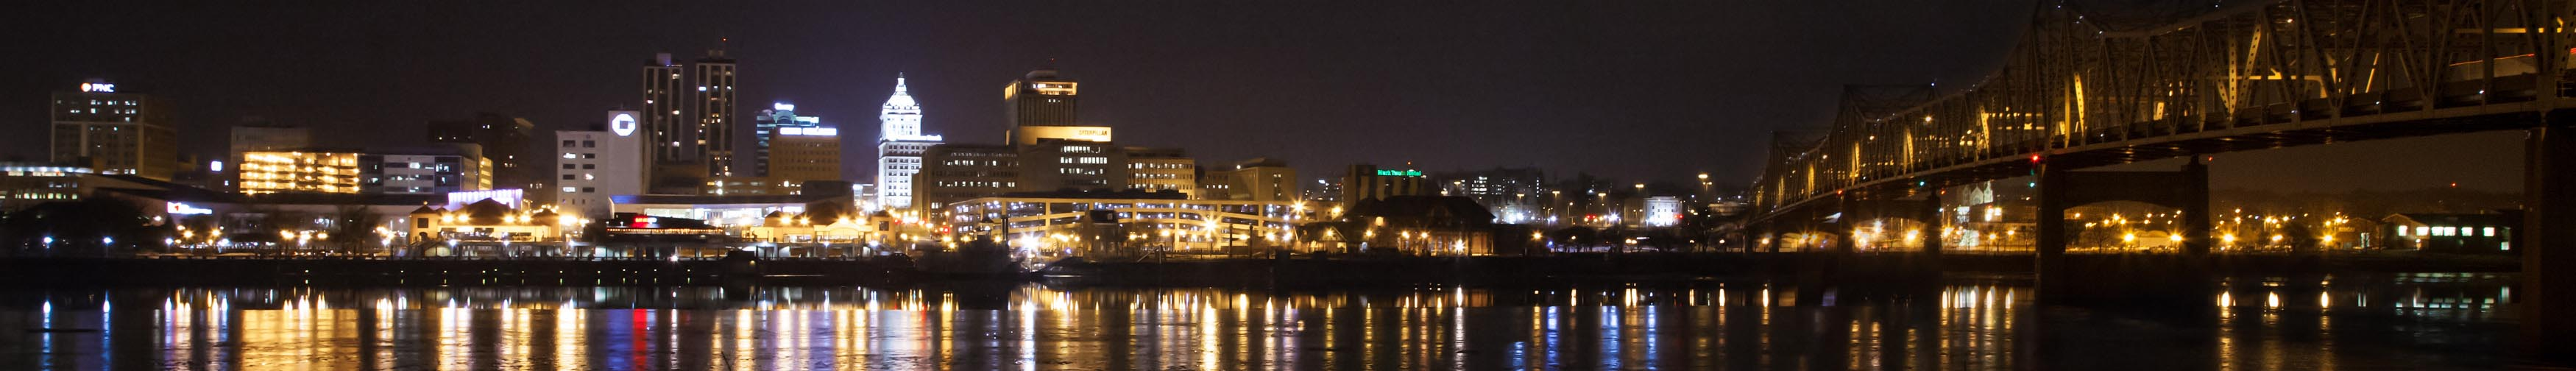 peoria_riverfront_crop